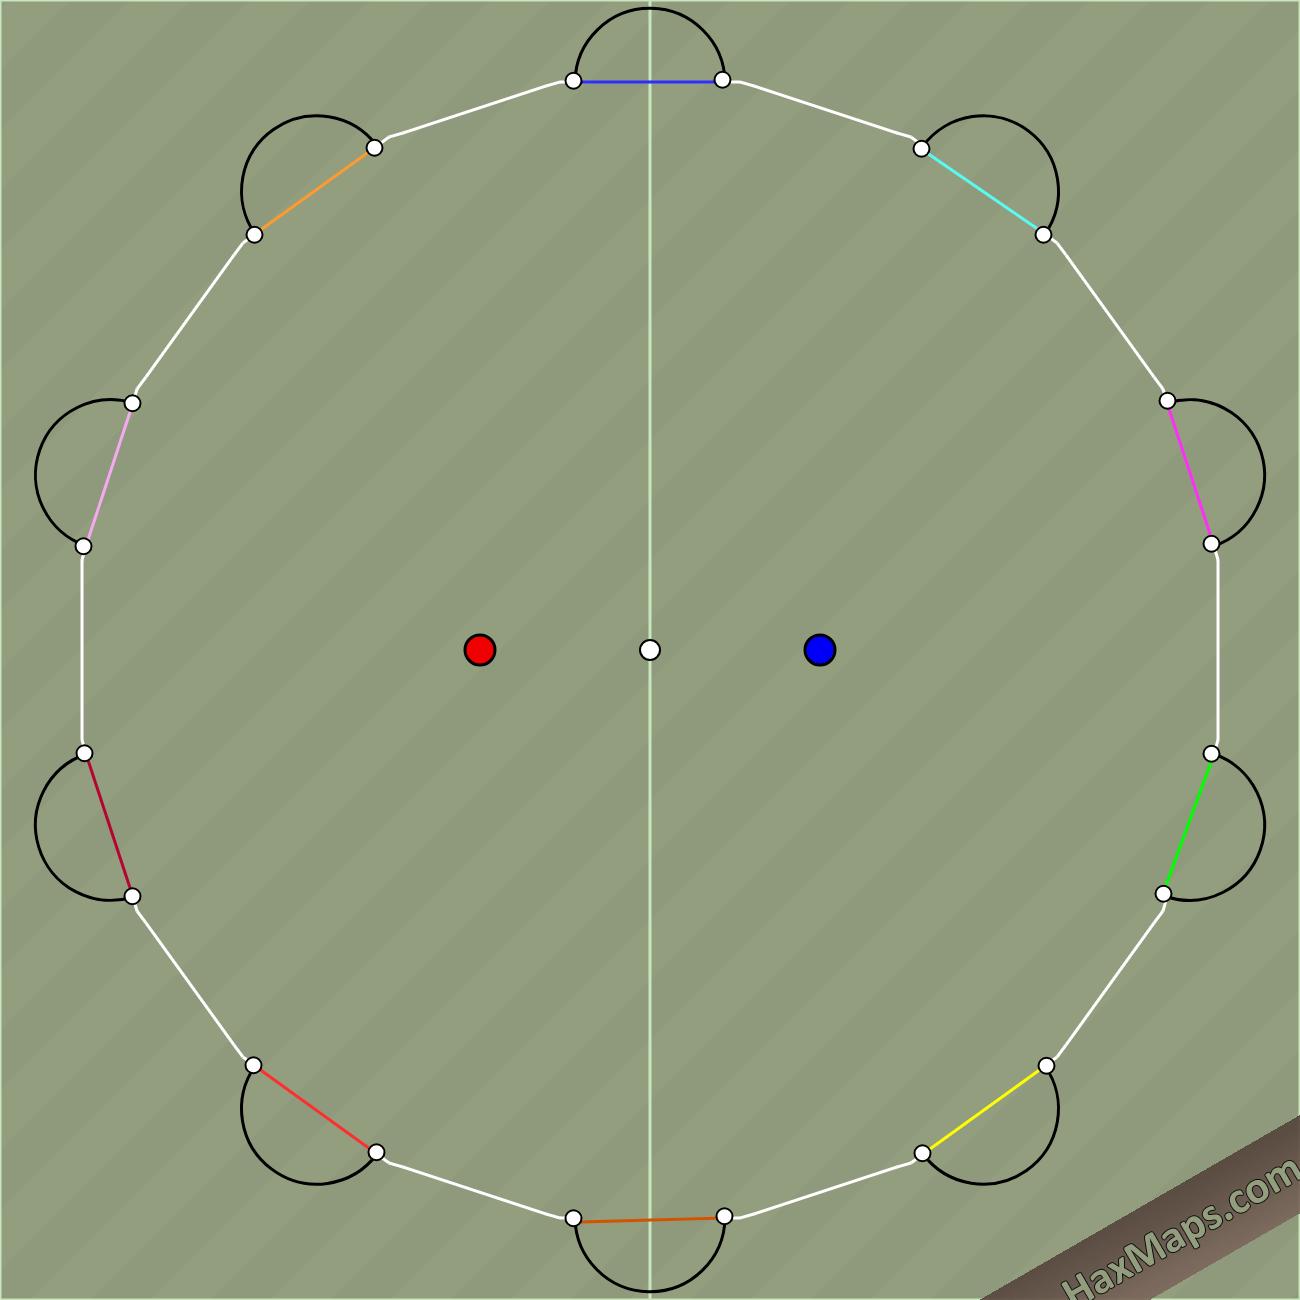 hax ball maps | v10 Japon Kale Full Html Version by Minerva